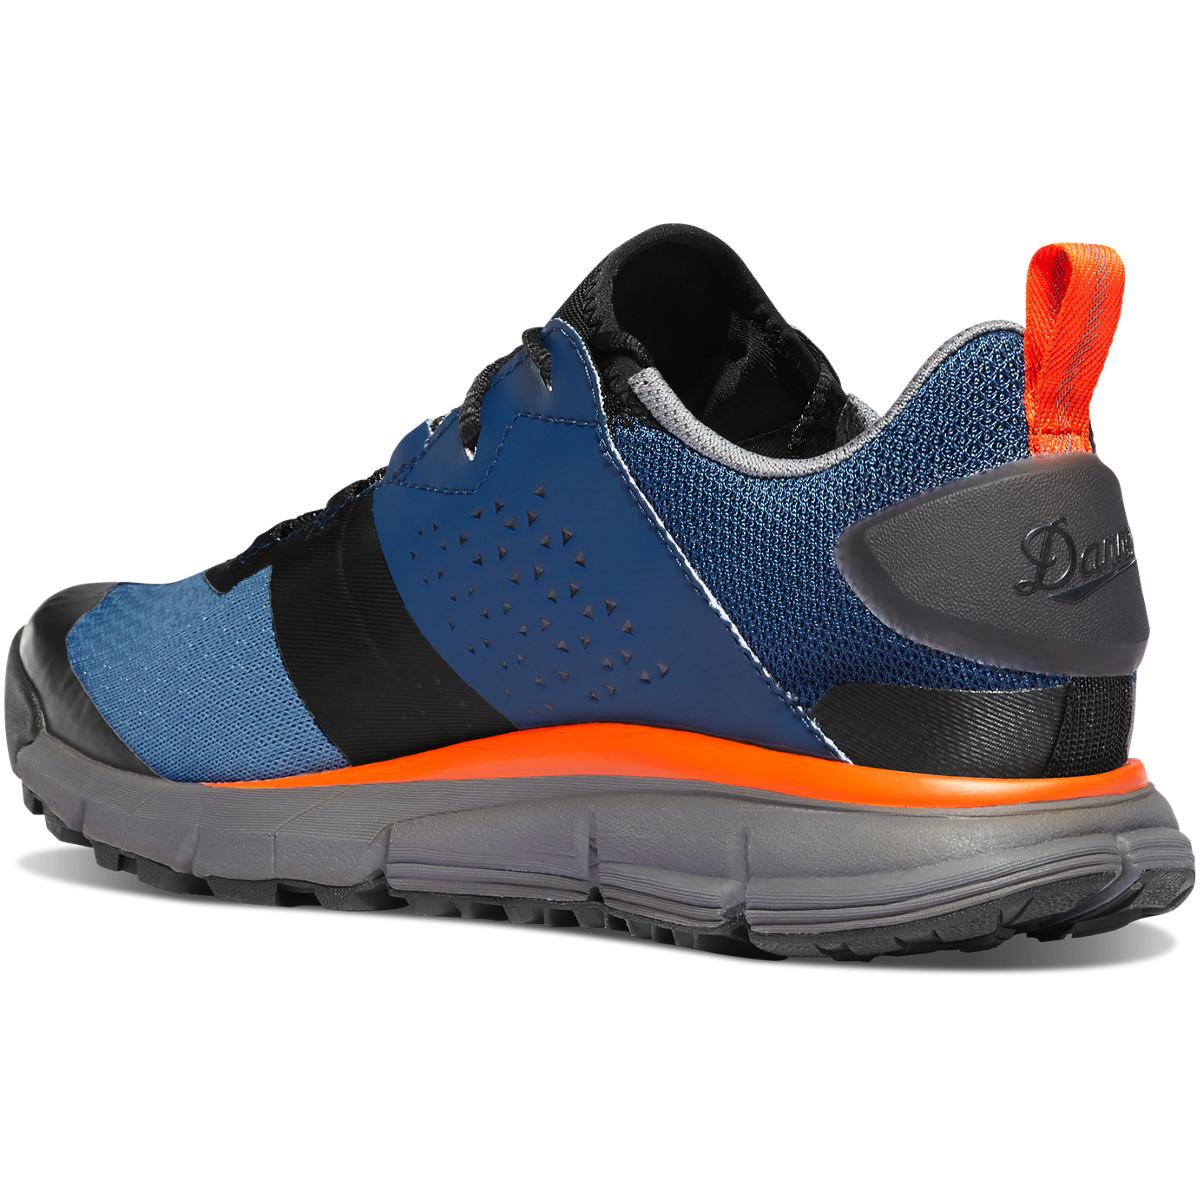 "Trail 2650 Campo 3"" Blue/Orange GTX"